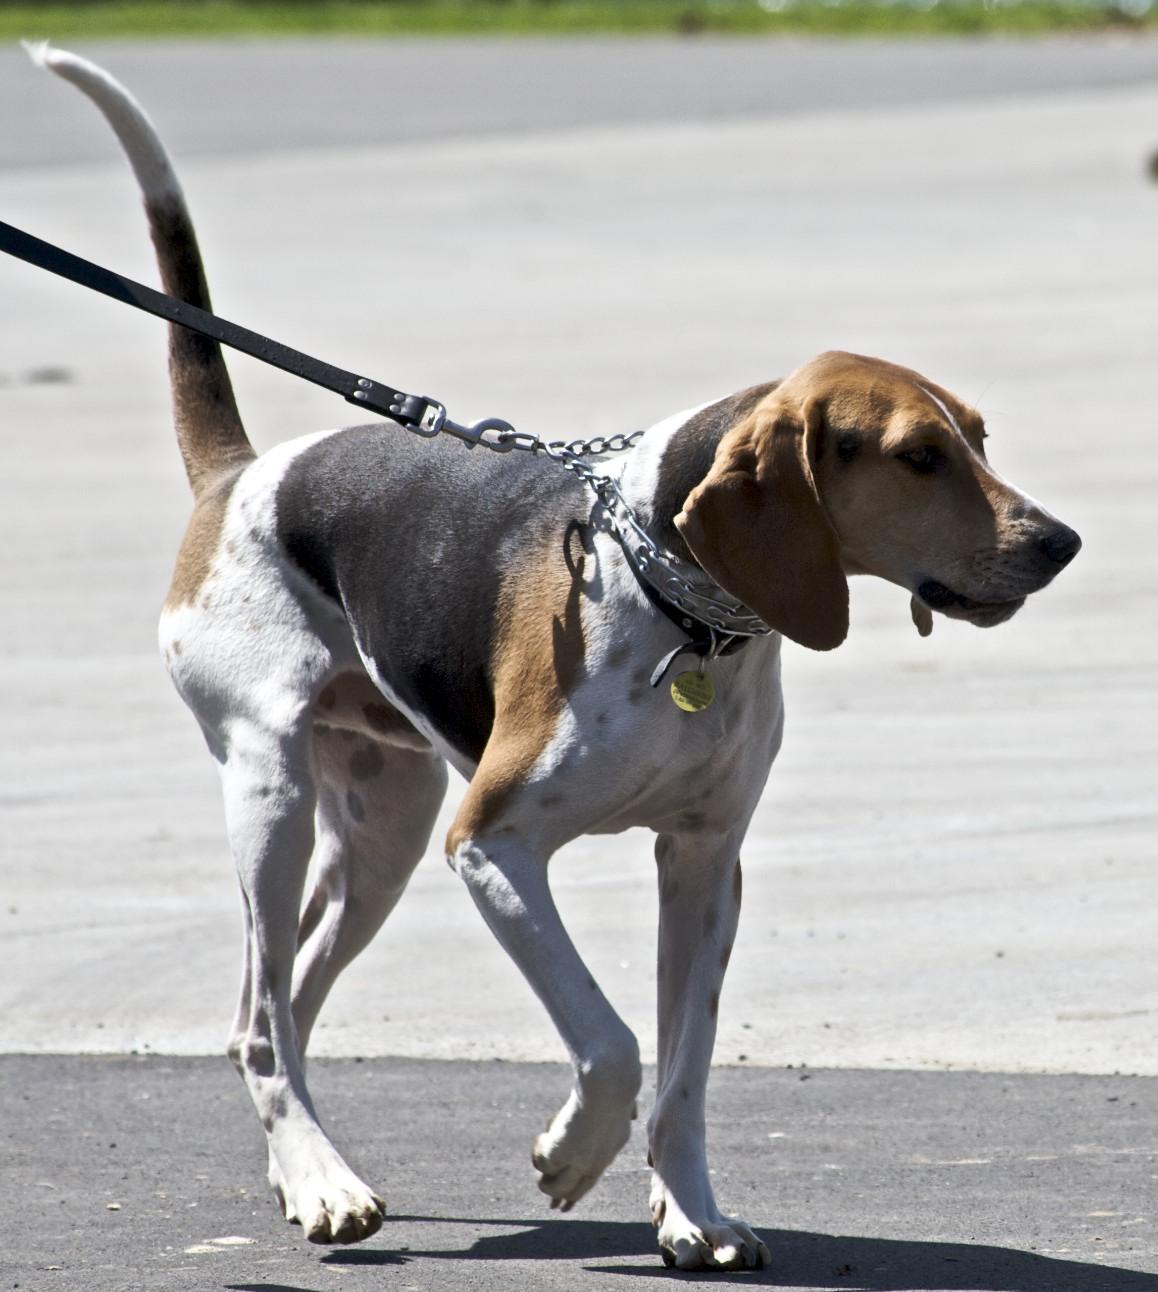 Best Dog Walking Training Harness